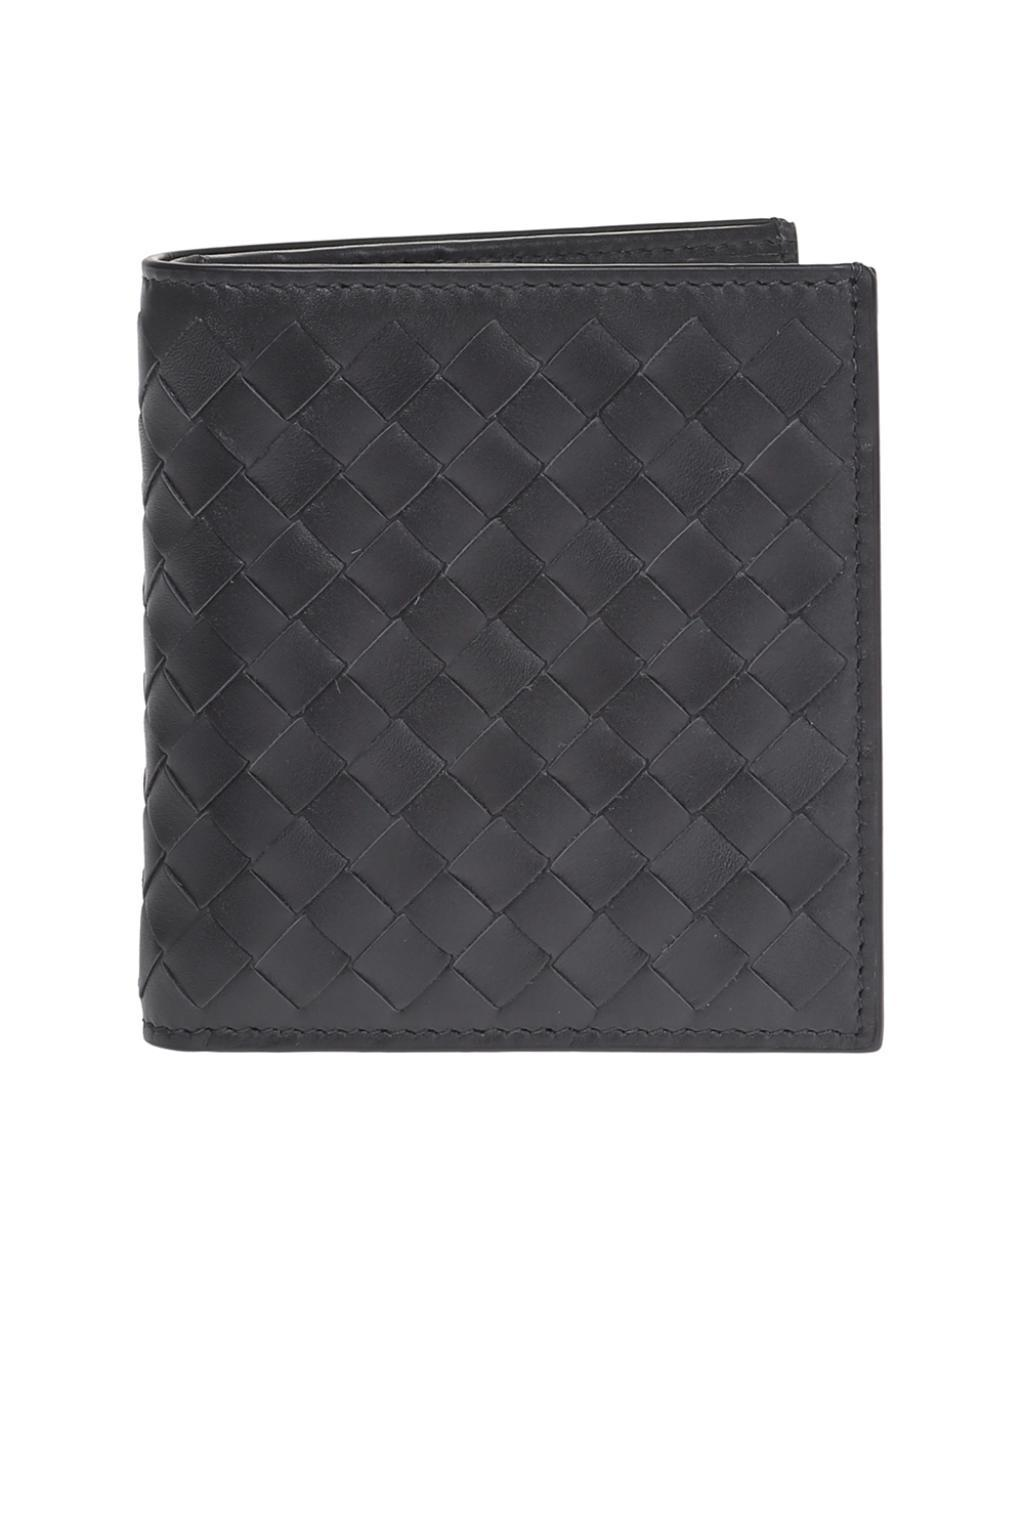 e6a25a28bfa019 Bottega Veneta Bi-fold Leather Wallet in Gray for Men - Lyst